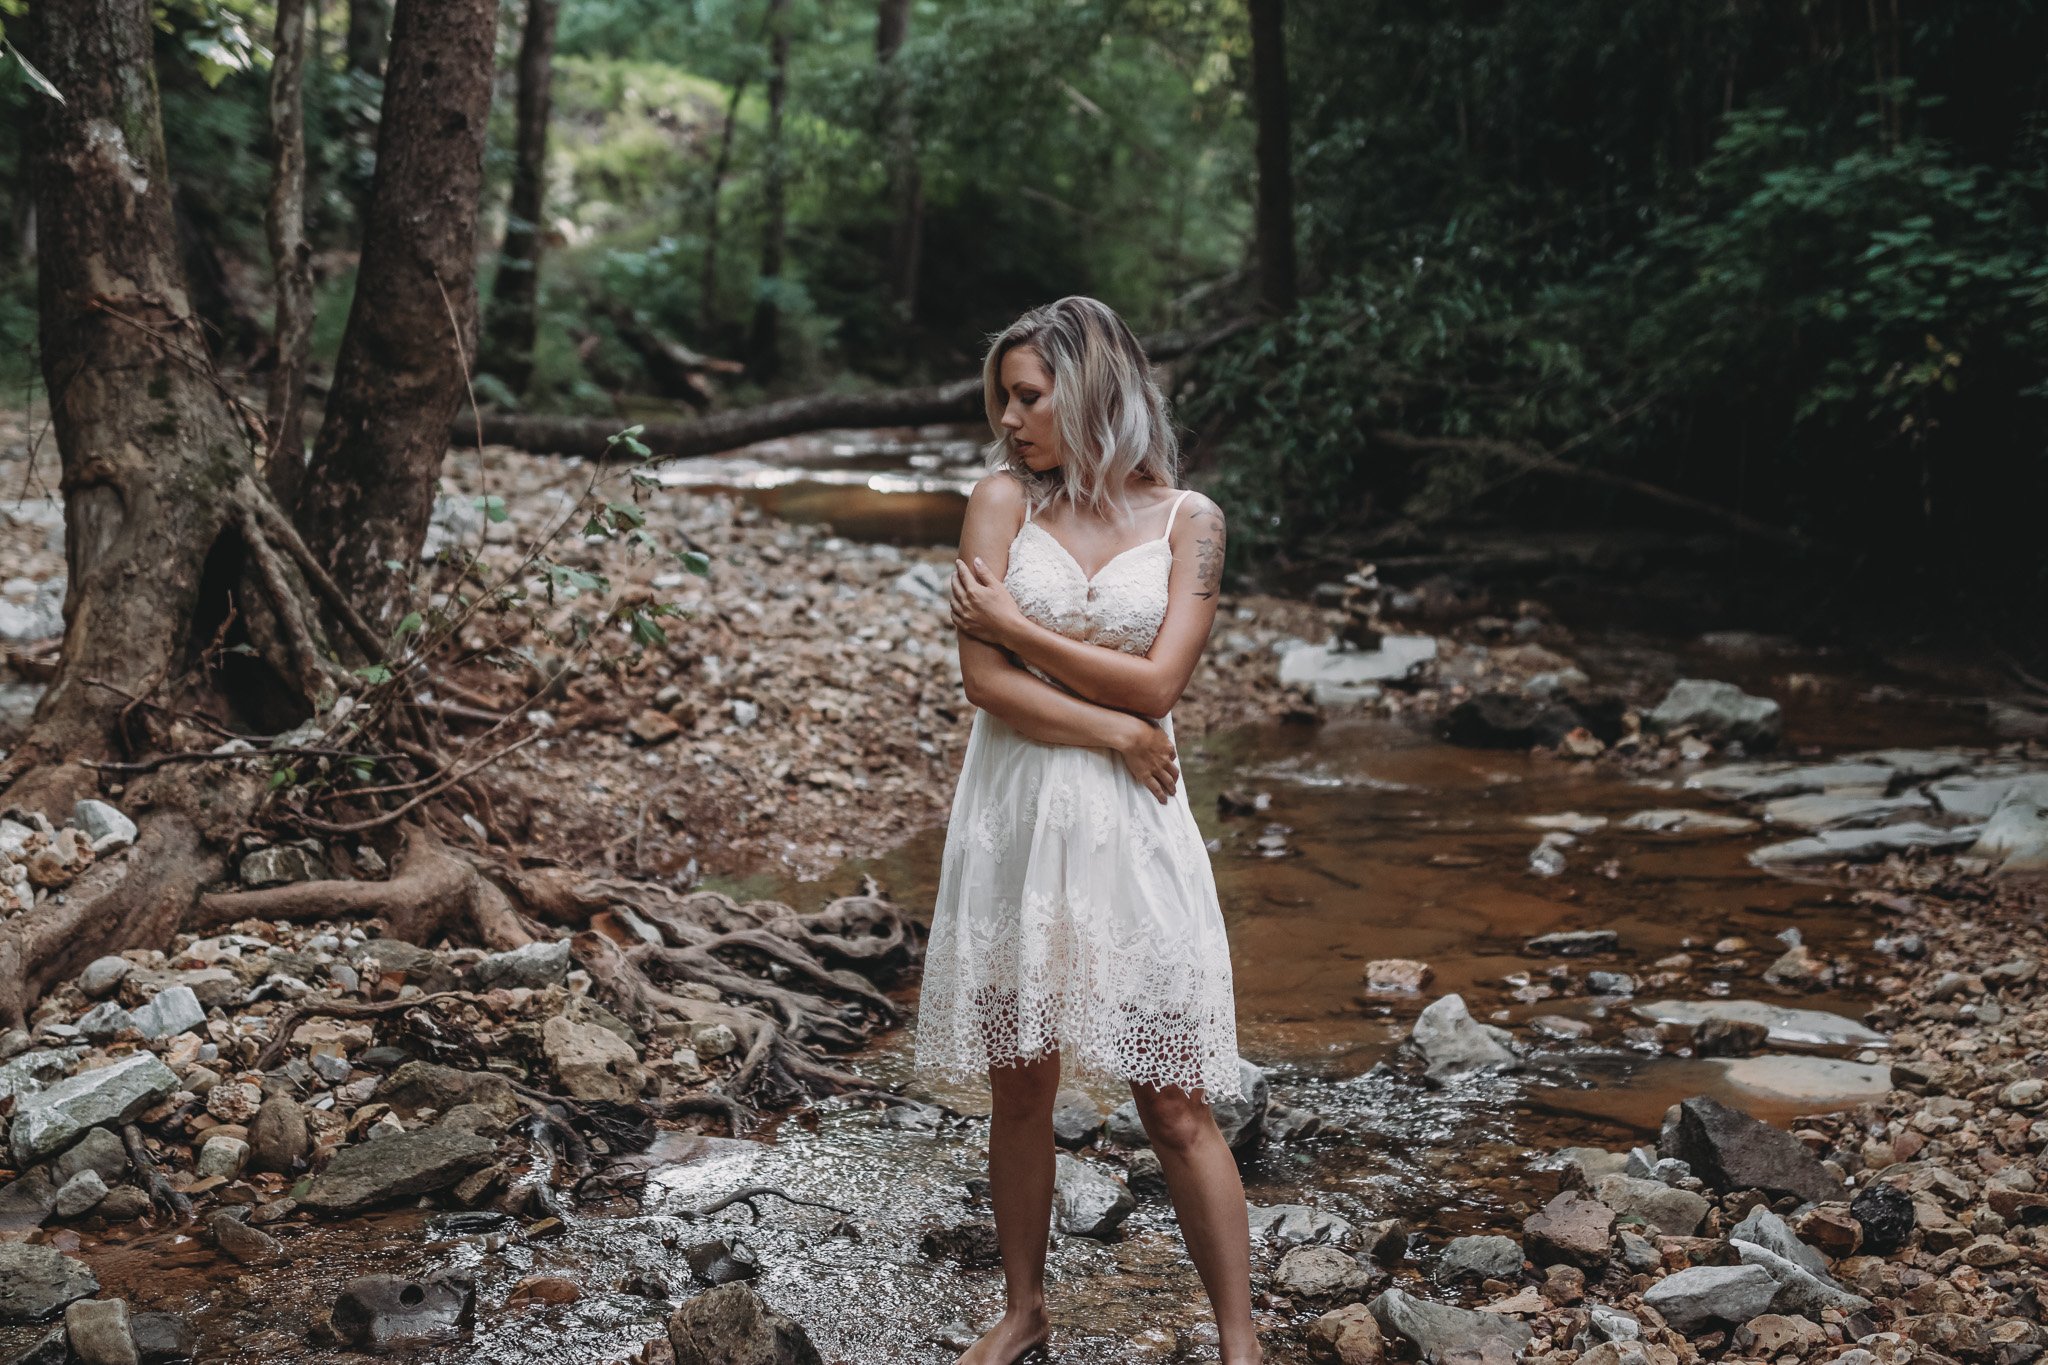 outdoor boudoir in a creek